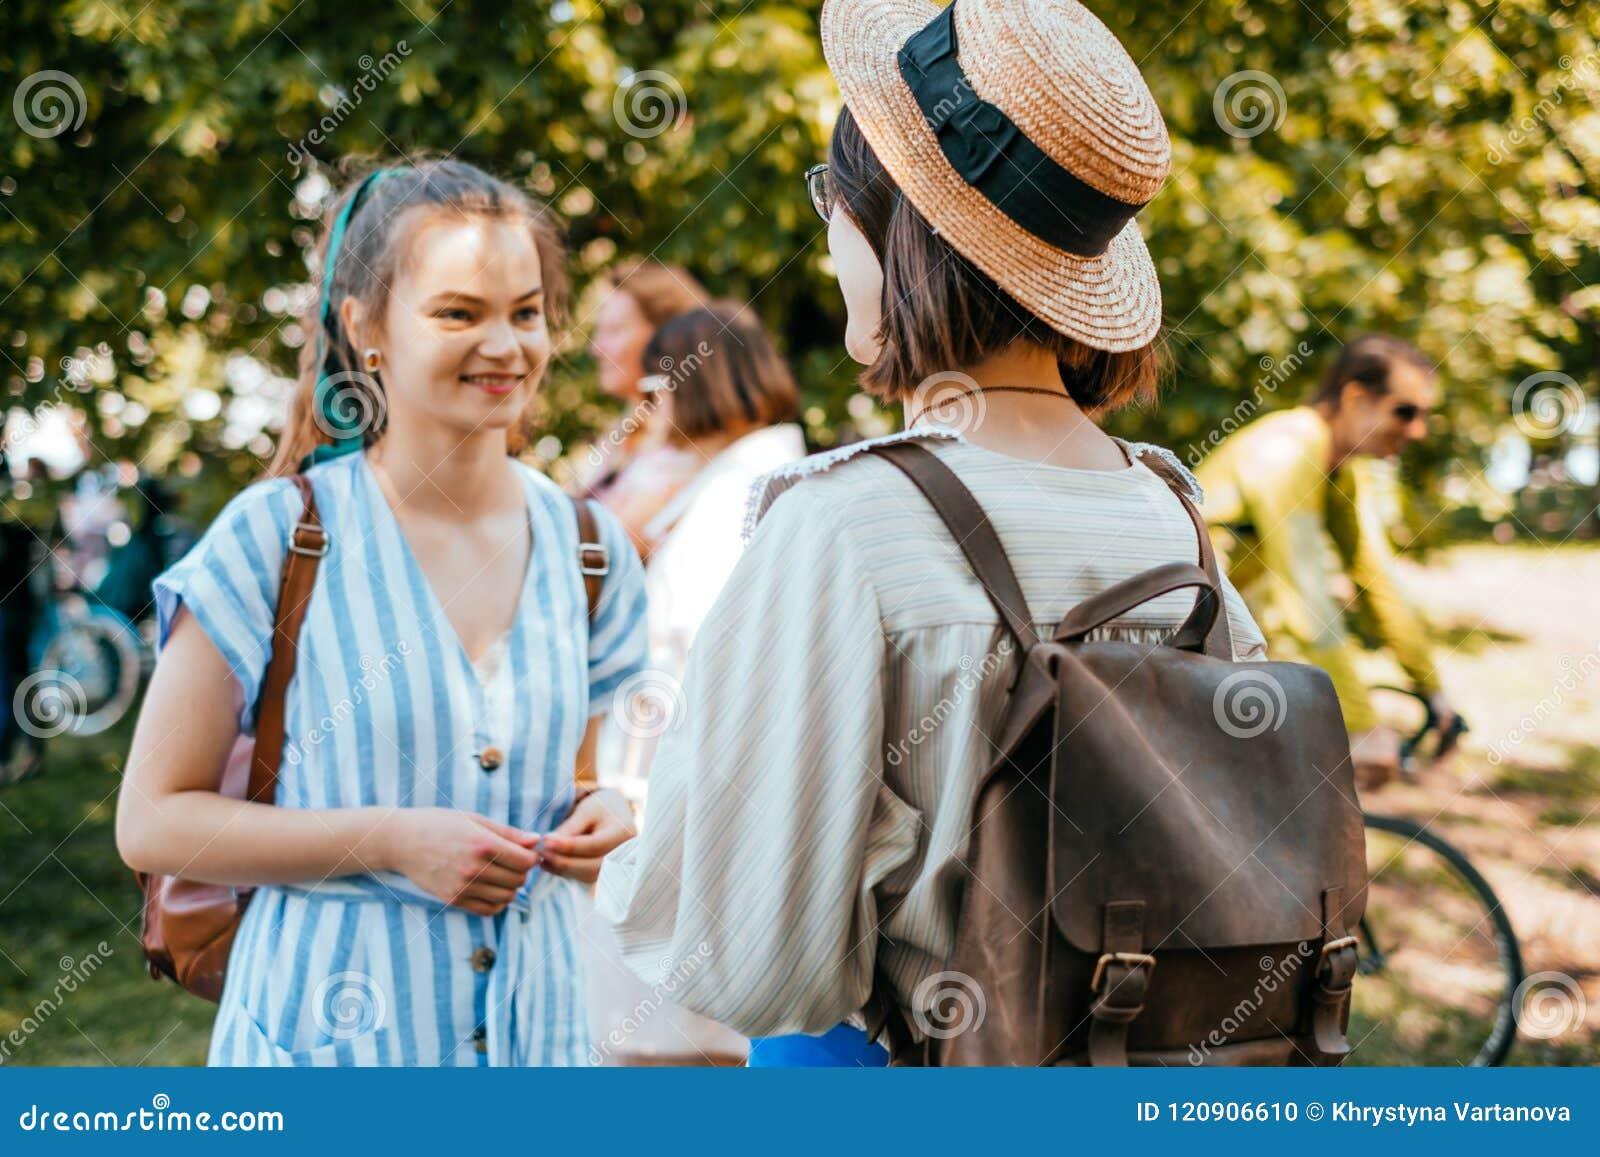 Kiew Dating